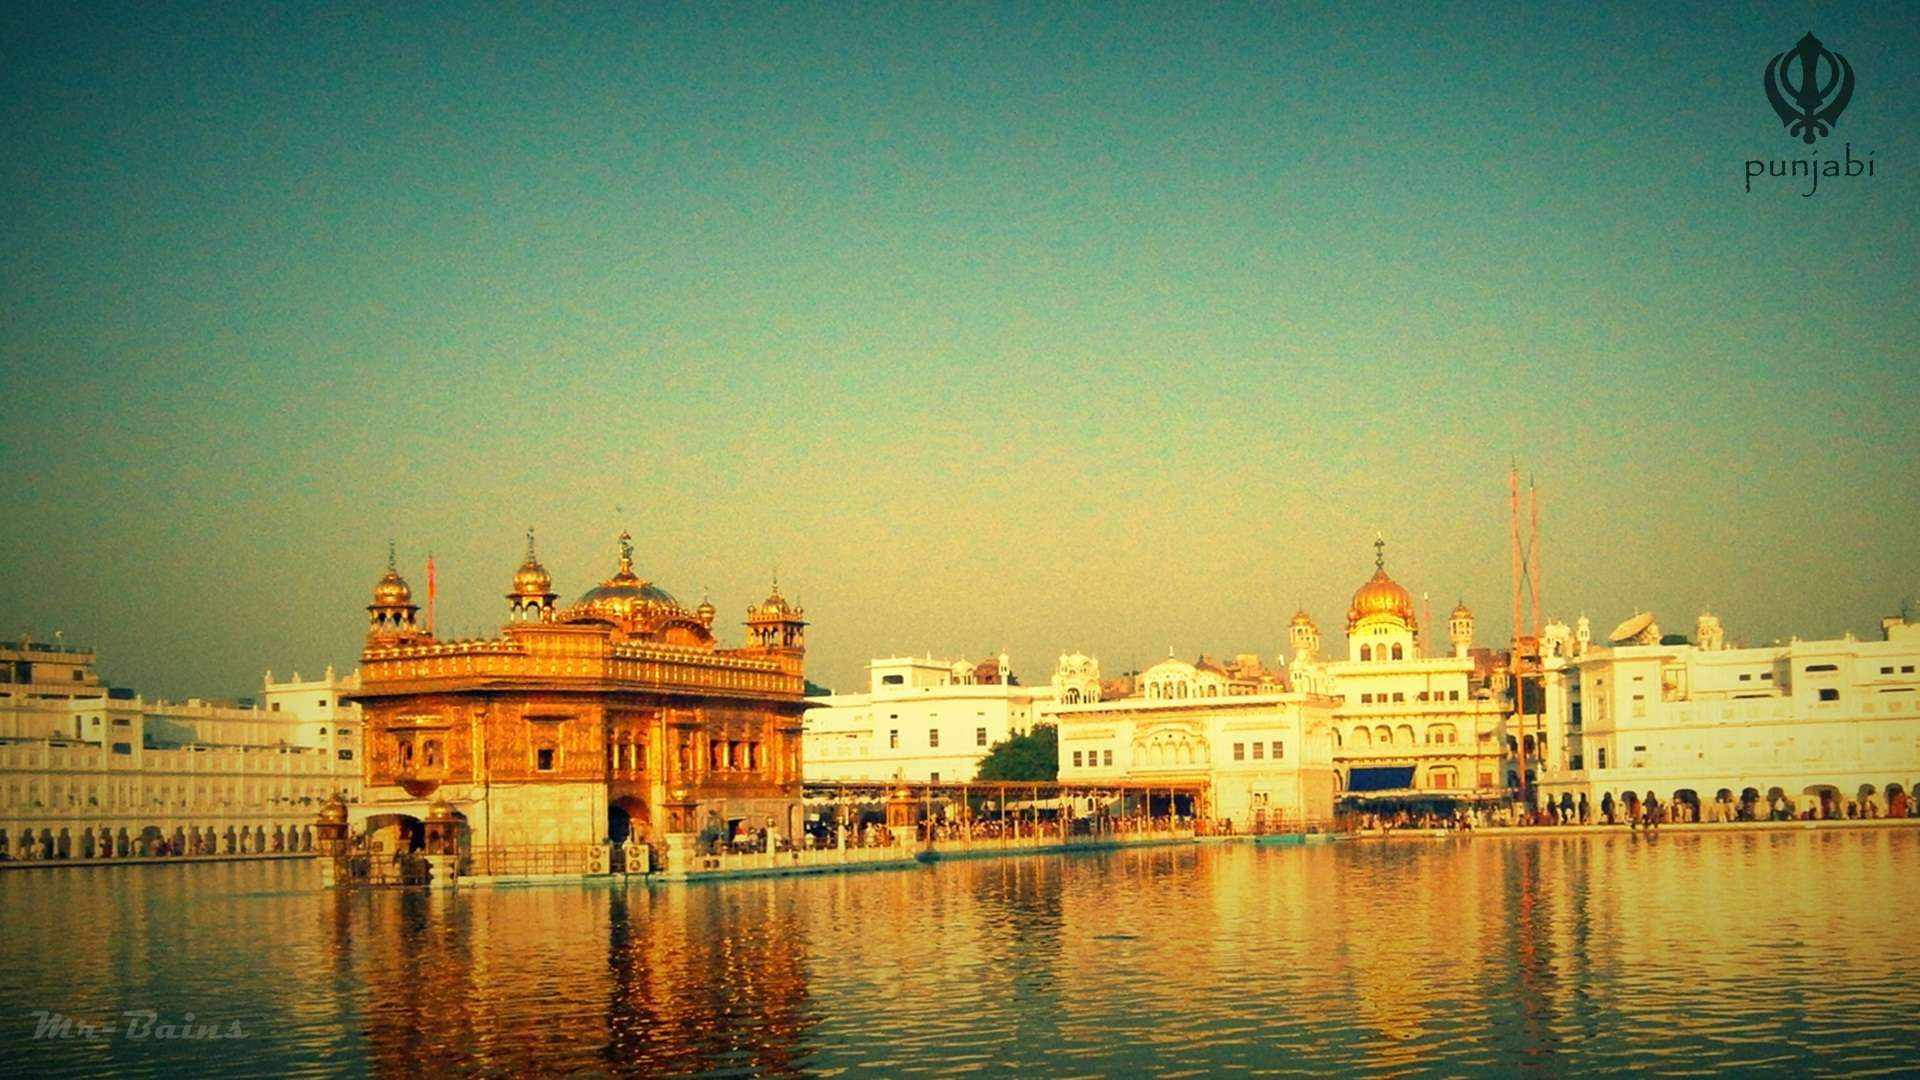 amritsar golden temple wallpaper | epic car wallpapers | pinterest